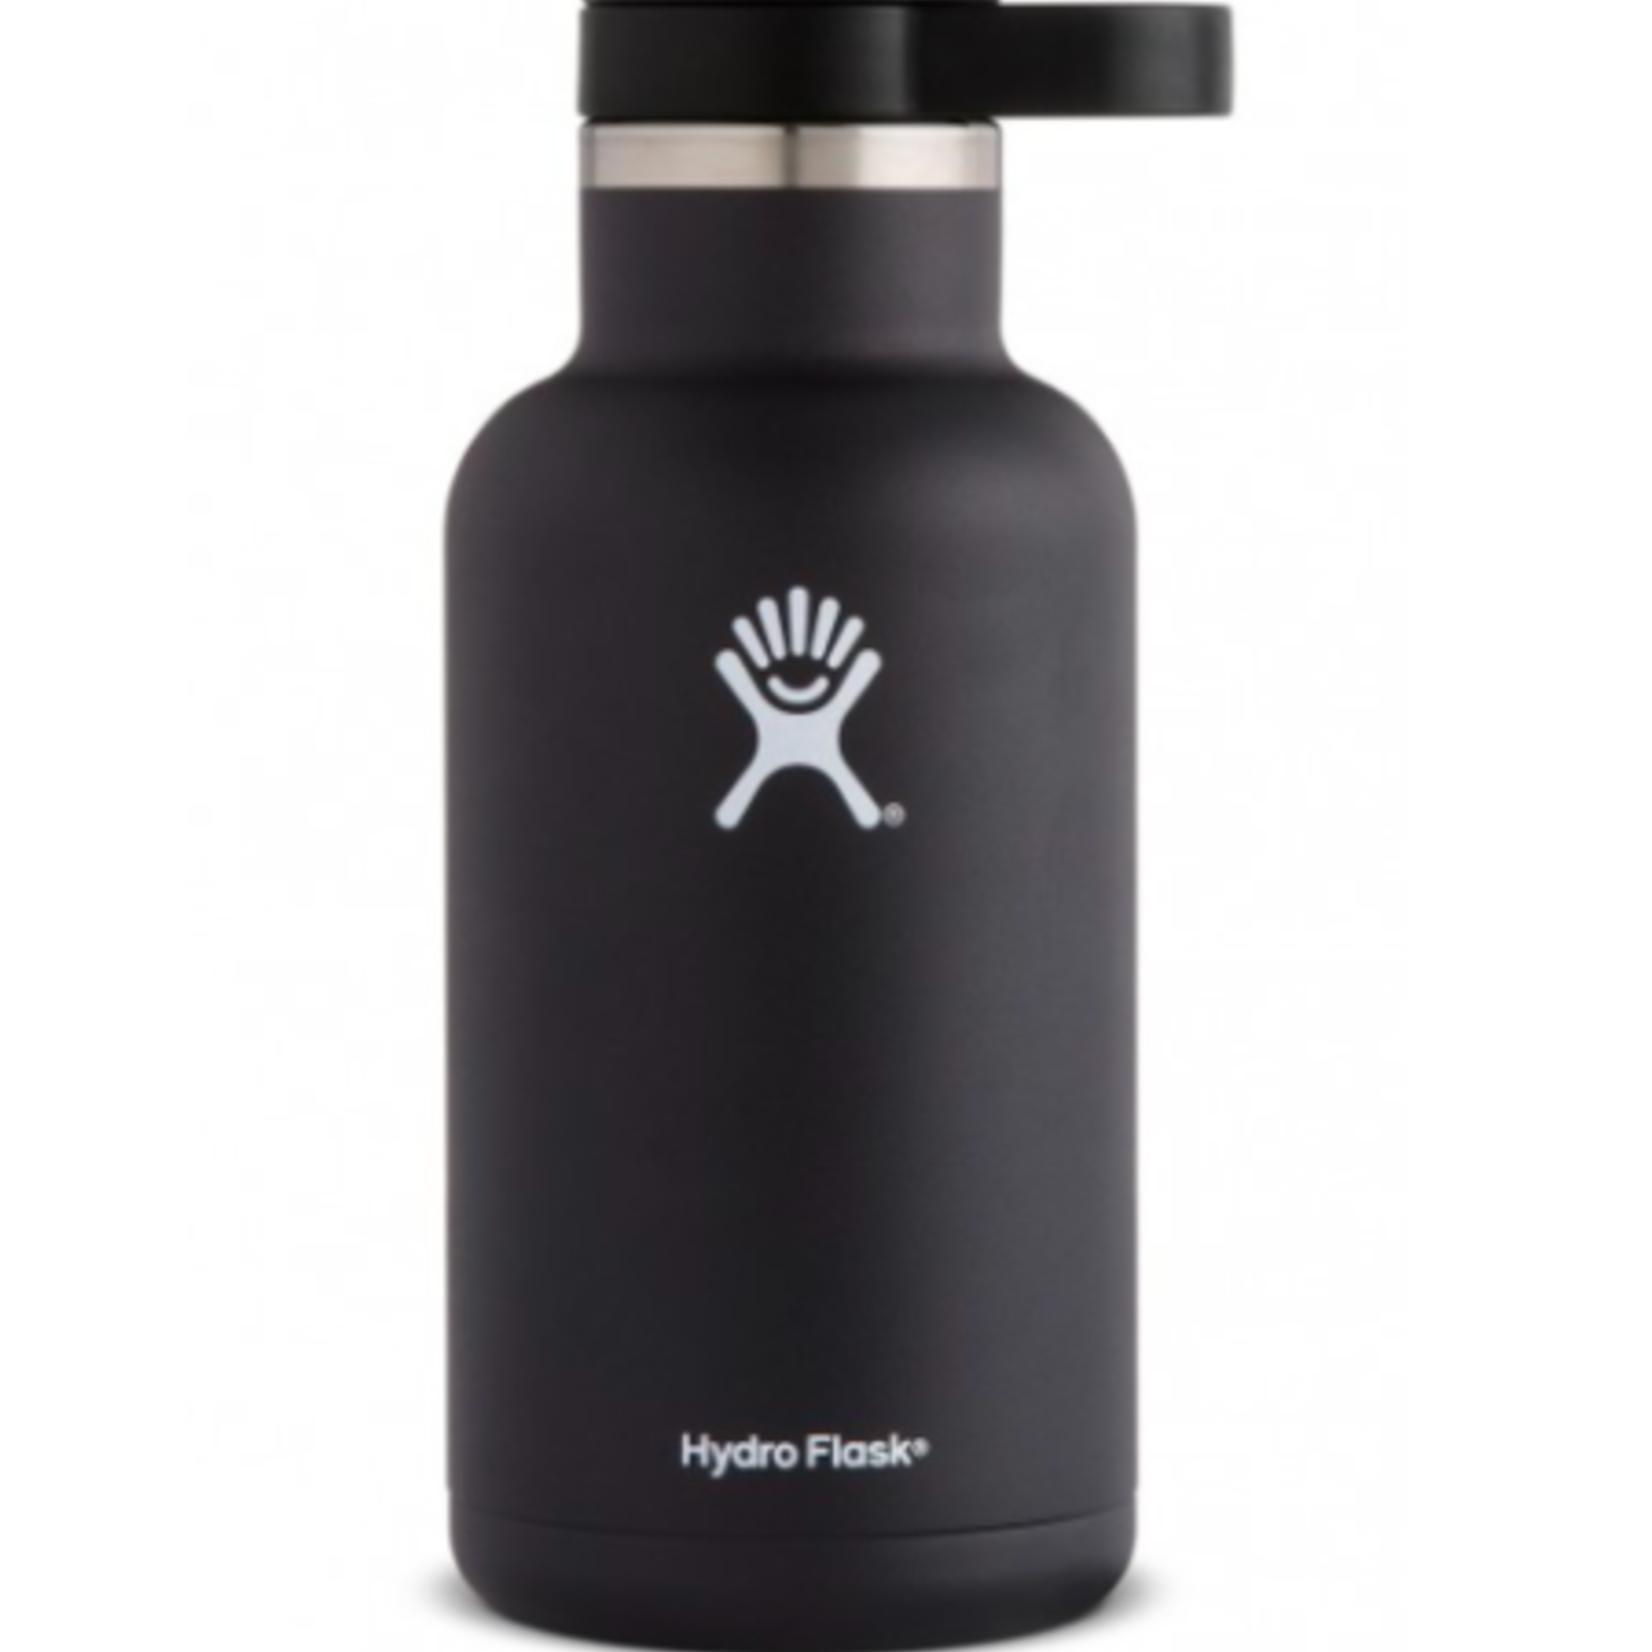 Hydro Flask Hydro Flask 64oz Beer Growler